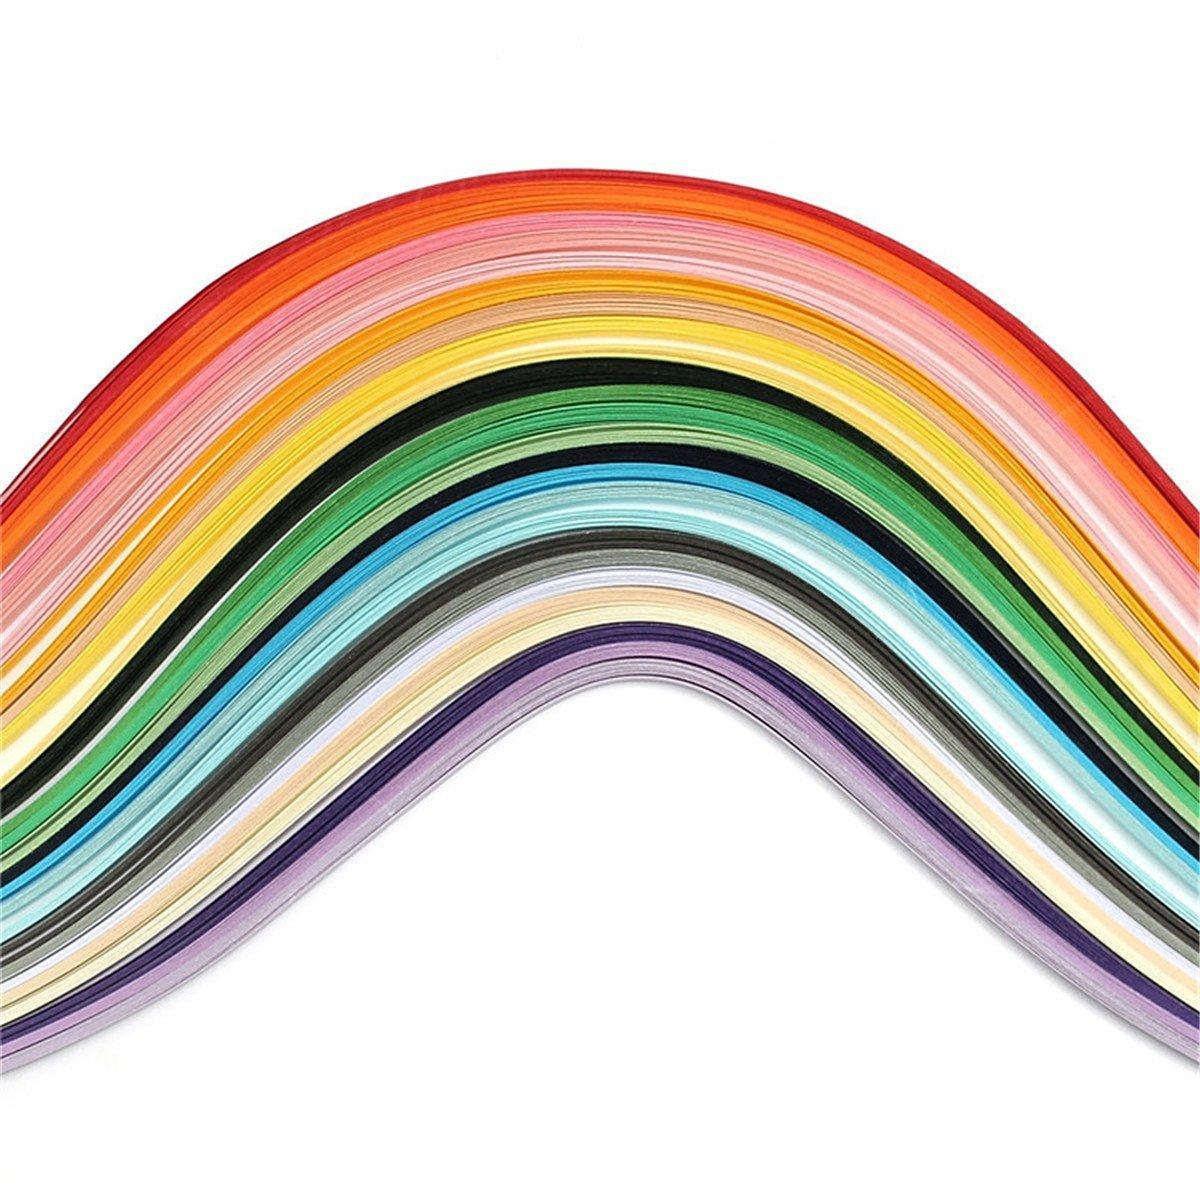 gespout 260 X carta quilling, vari colori strisce di carta, per DIY artigianato carta, Origami, Froebelsterne.